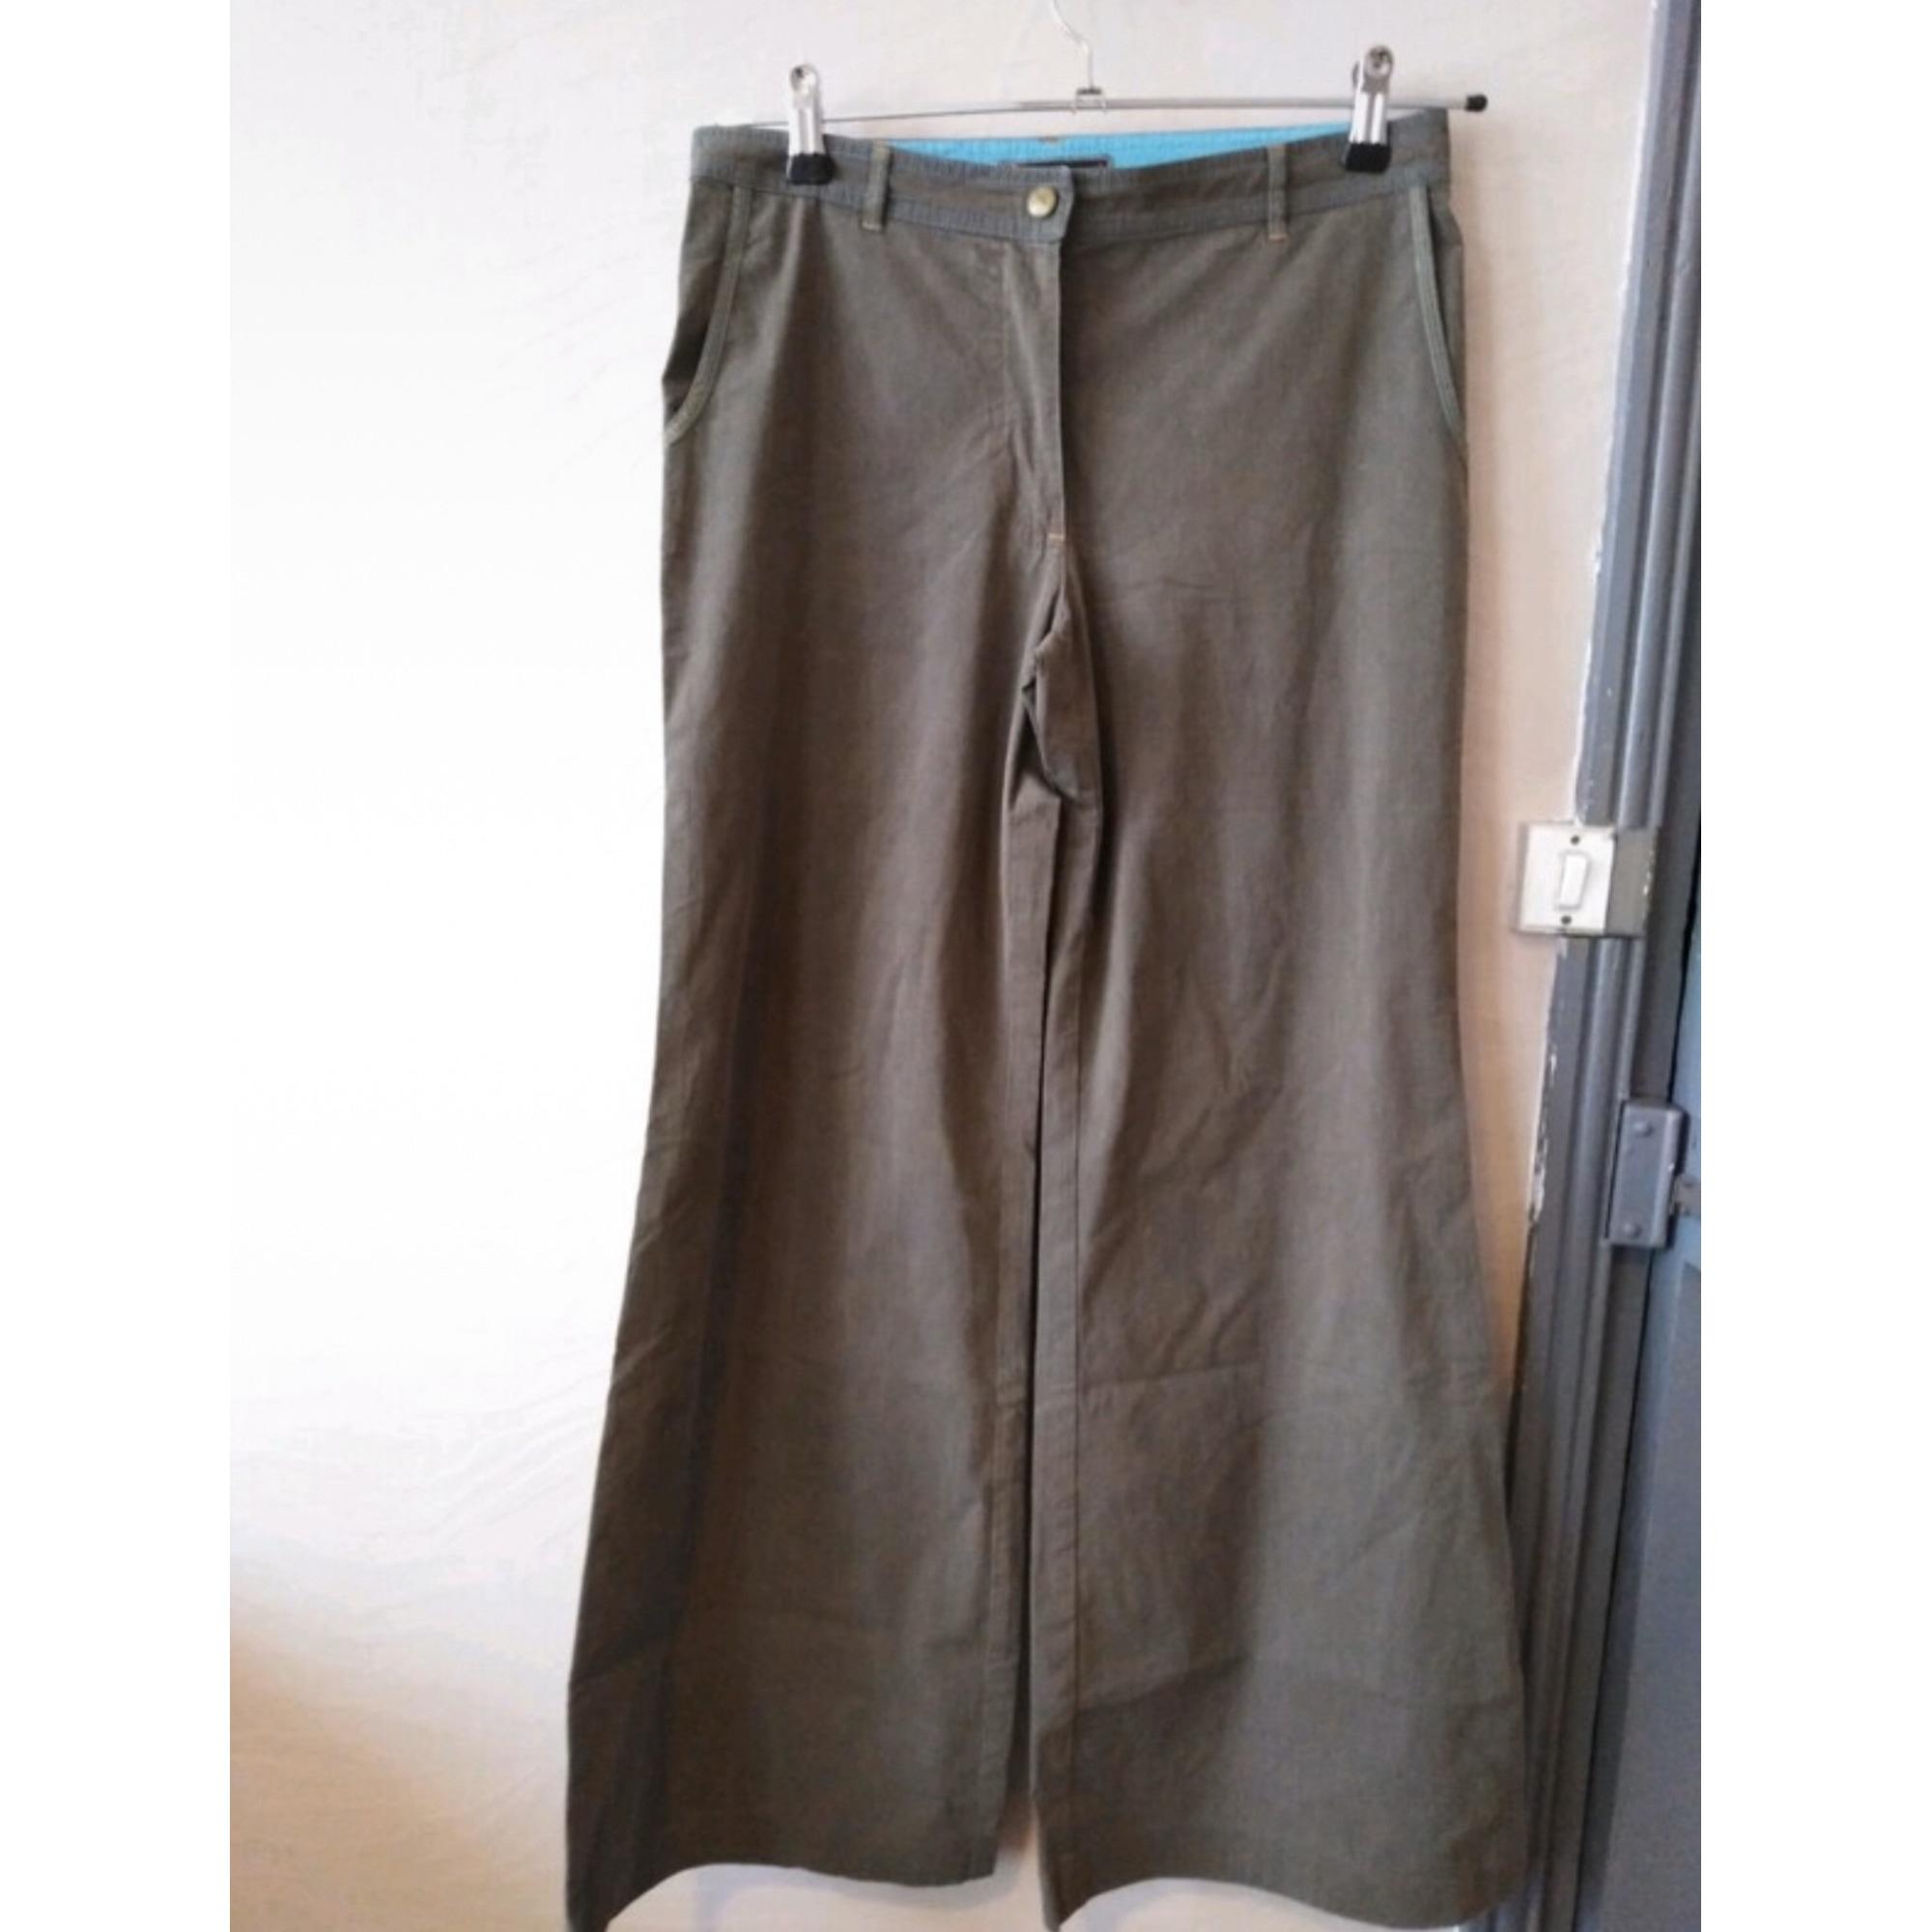 Pantalon évasé COP-COPINE Kaki